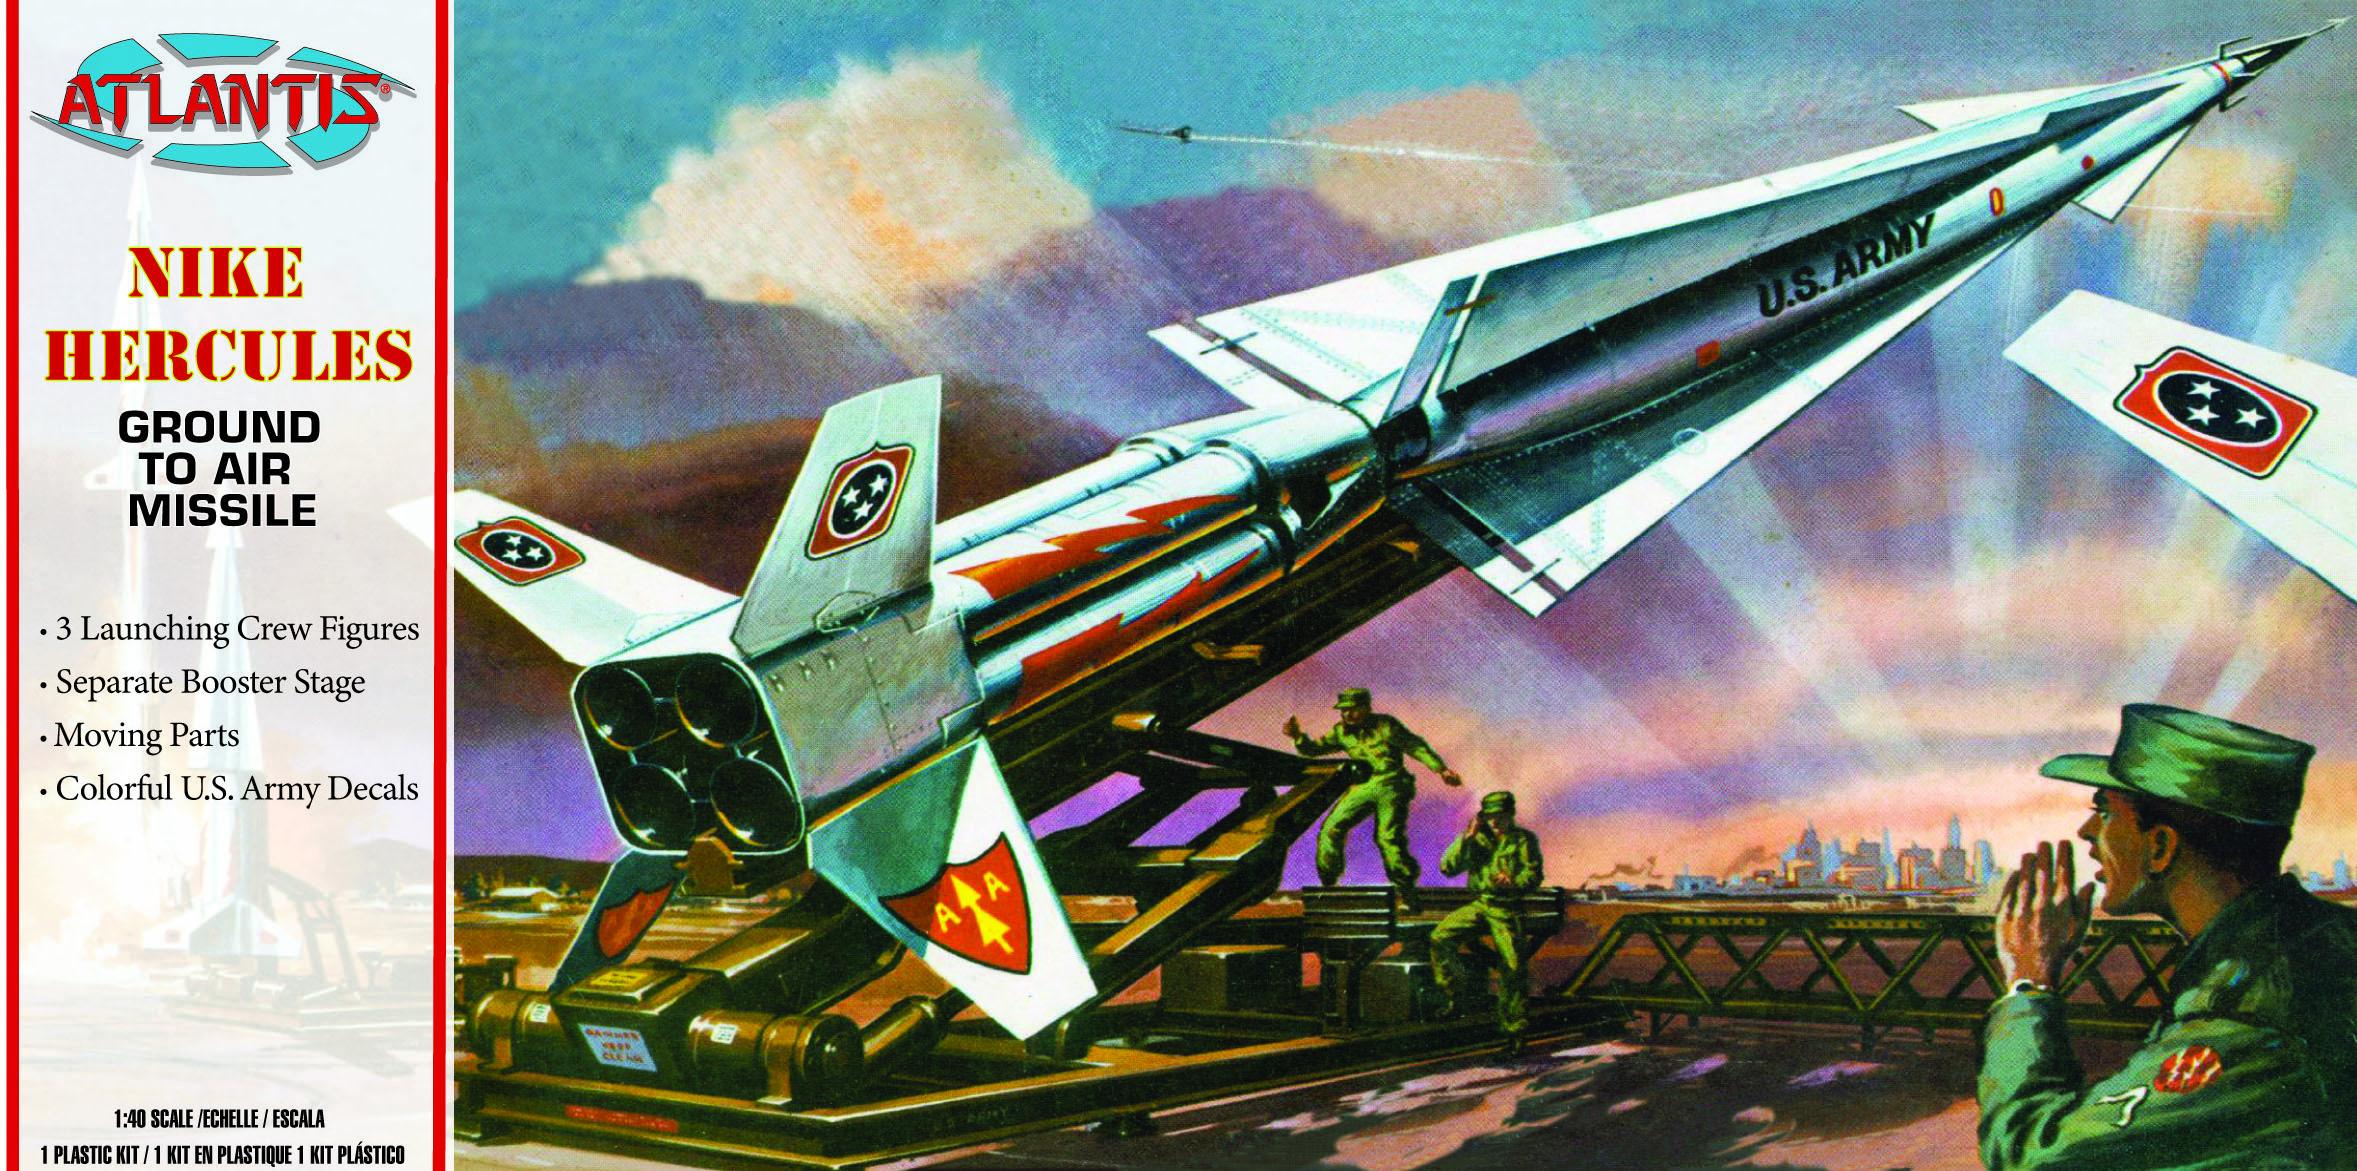 Atlantis 1/40 Nike Hercules Missile US Army